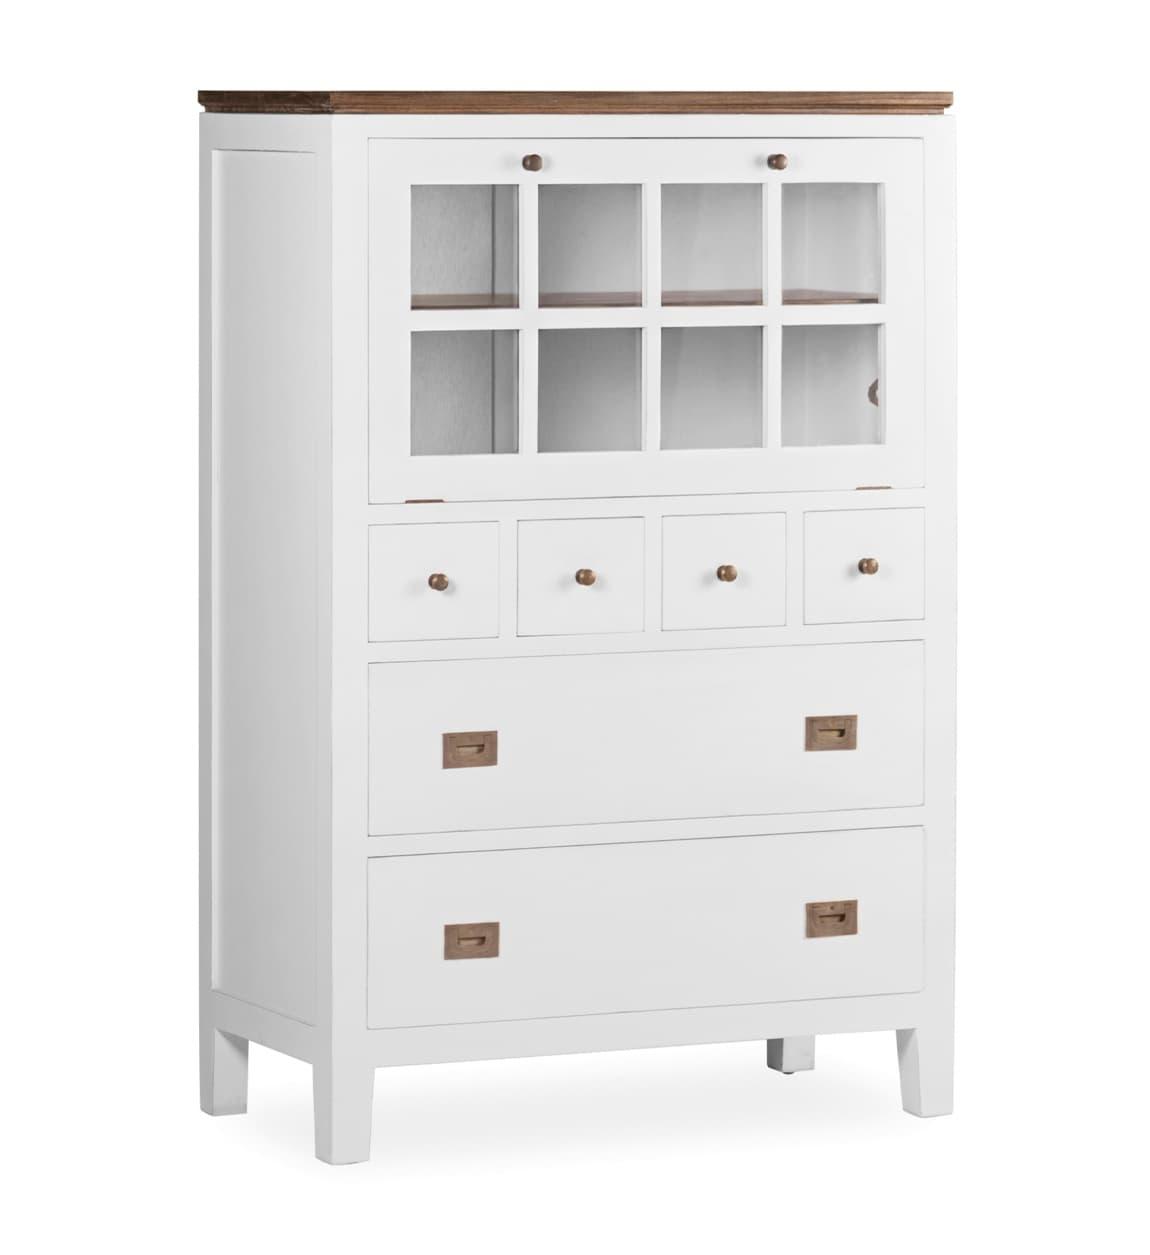 Cabinet cu vitrina din lemn, cu 6 sertare si 1 usa, Everest Big Alb / Maro, l90xA45xH135 cm somproduct.ro